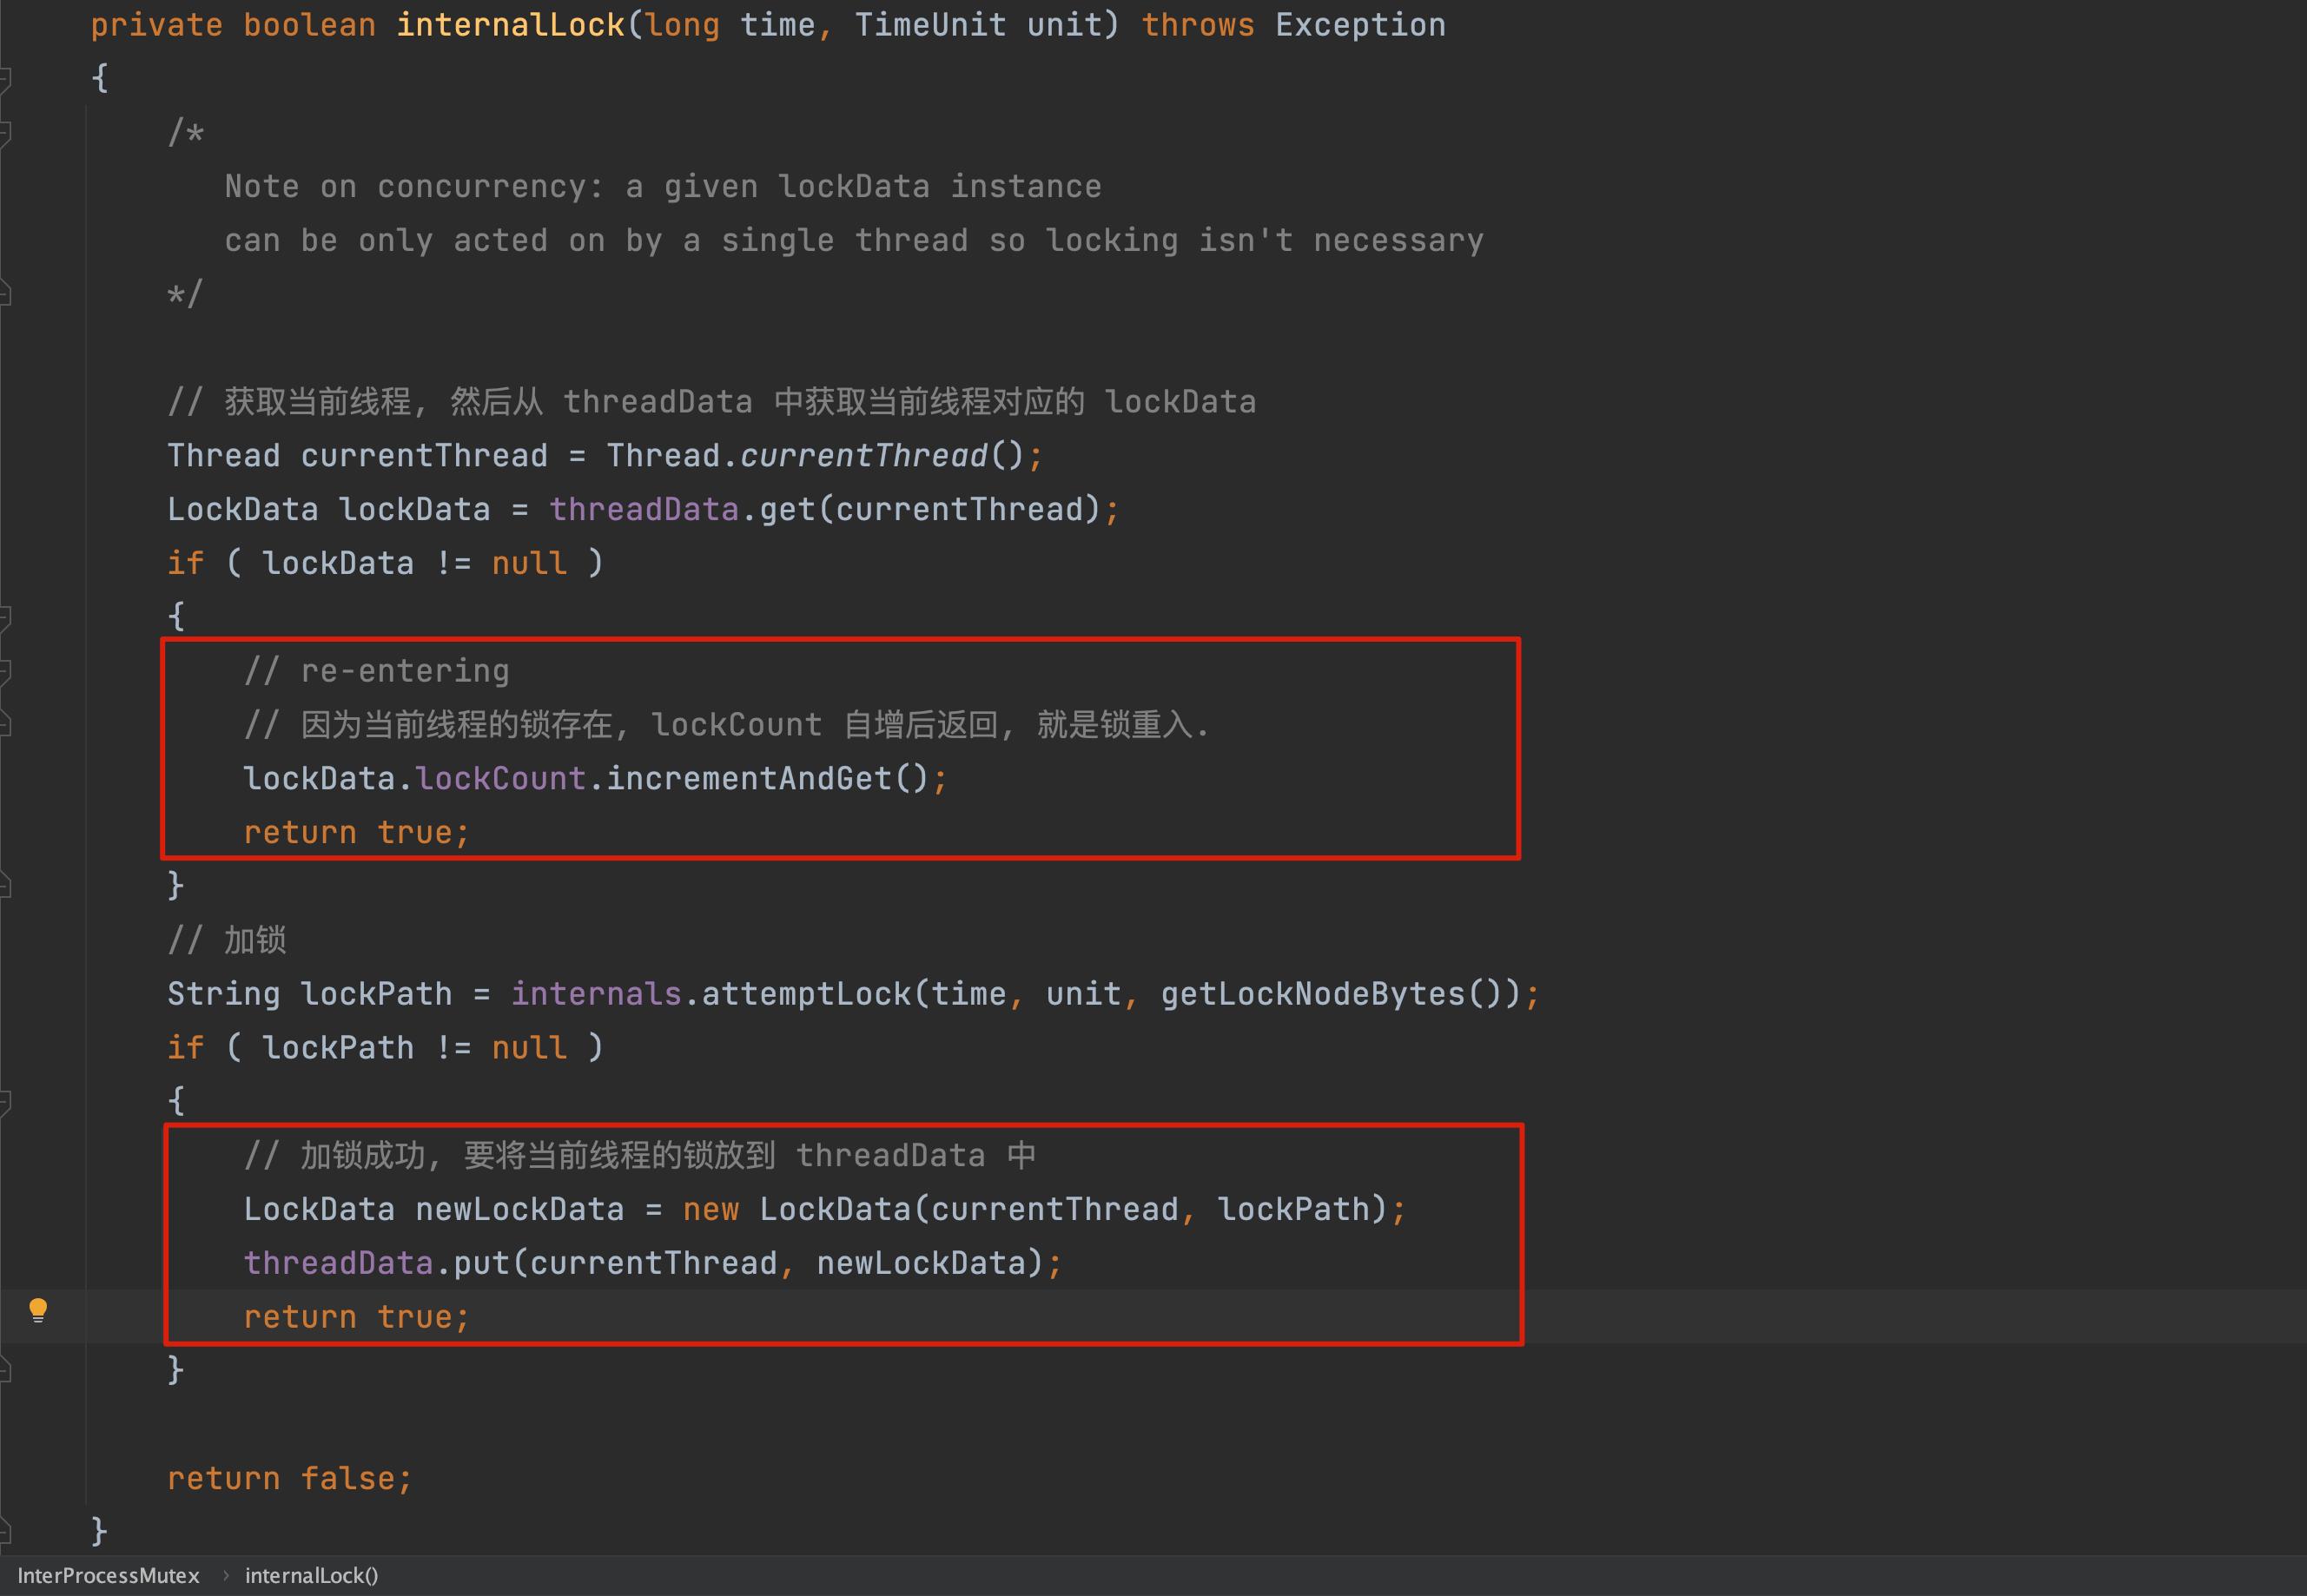 ZooKeeper 分散式鎖 Curator 原始碼 02:可重入鎖重複加鎖和鎖釋放